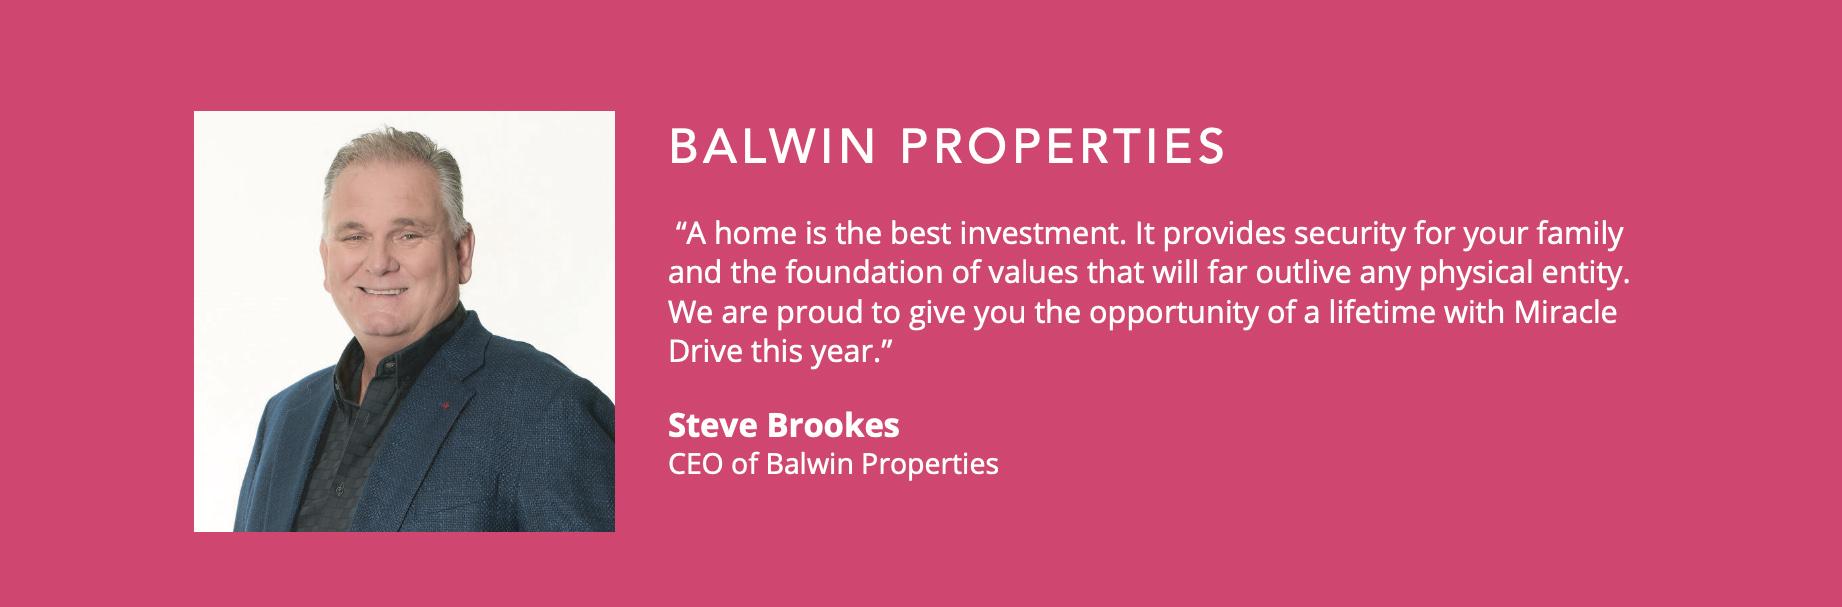 Balwin Testimonial